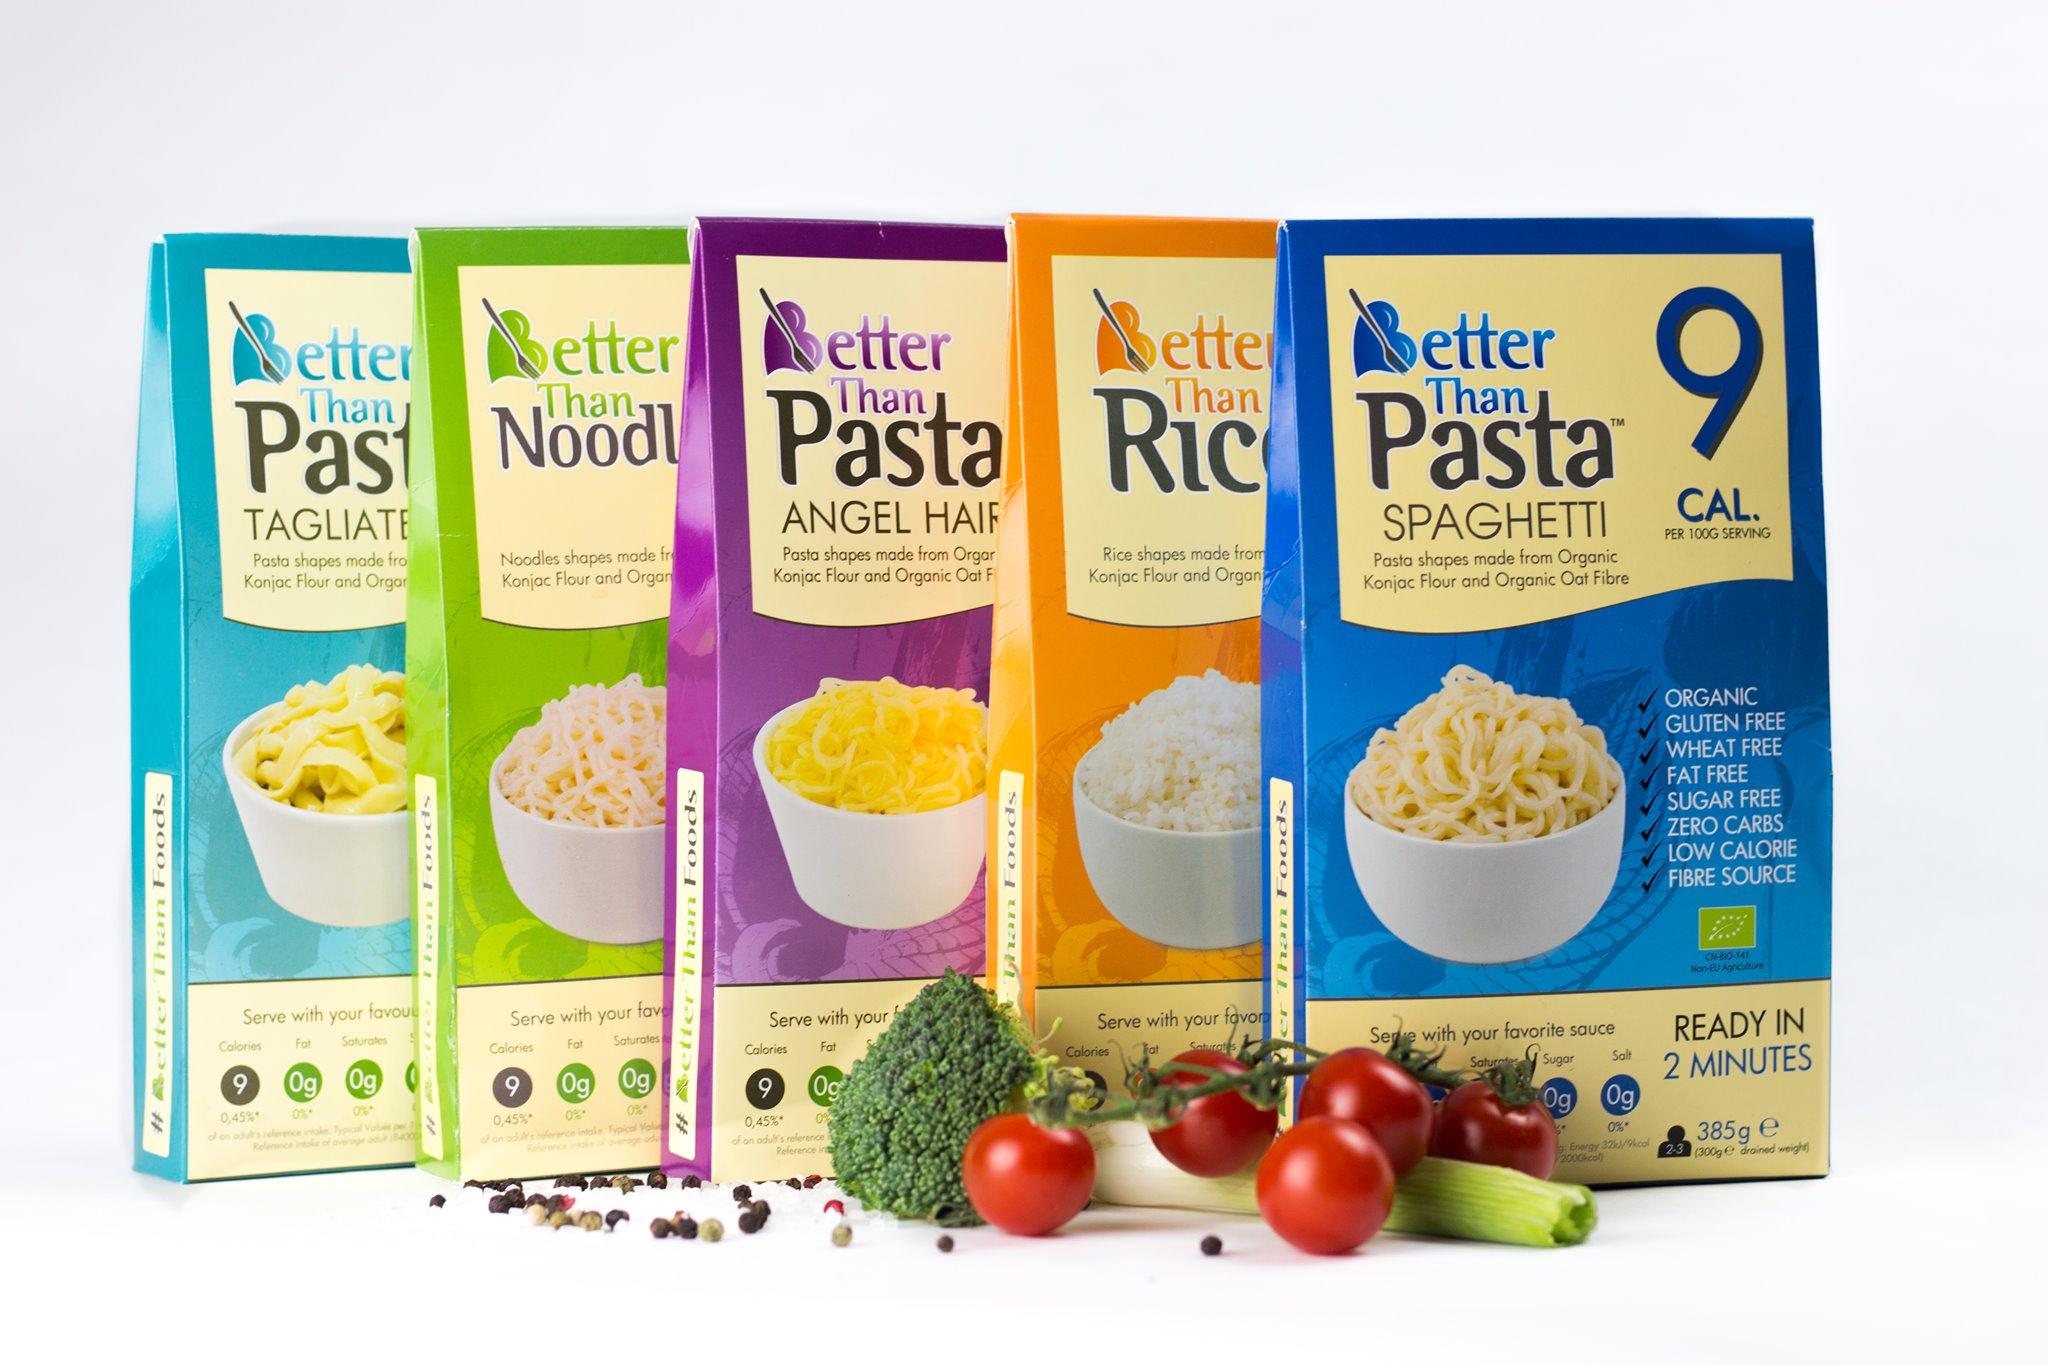 better than pasta  veggy malta